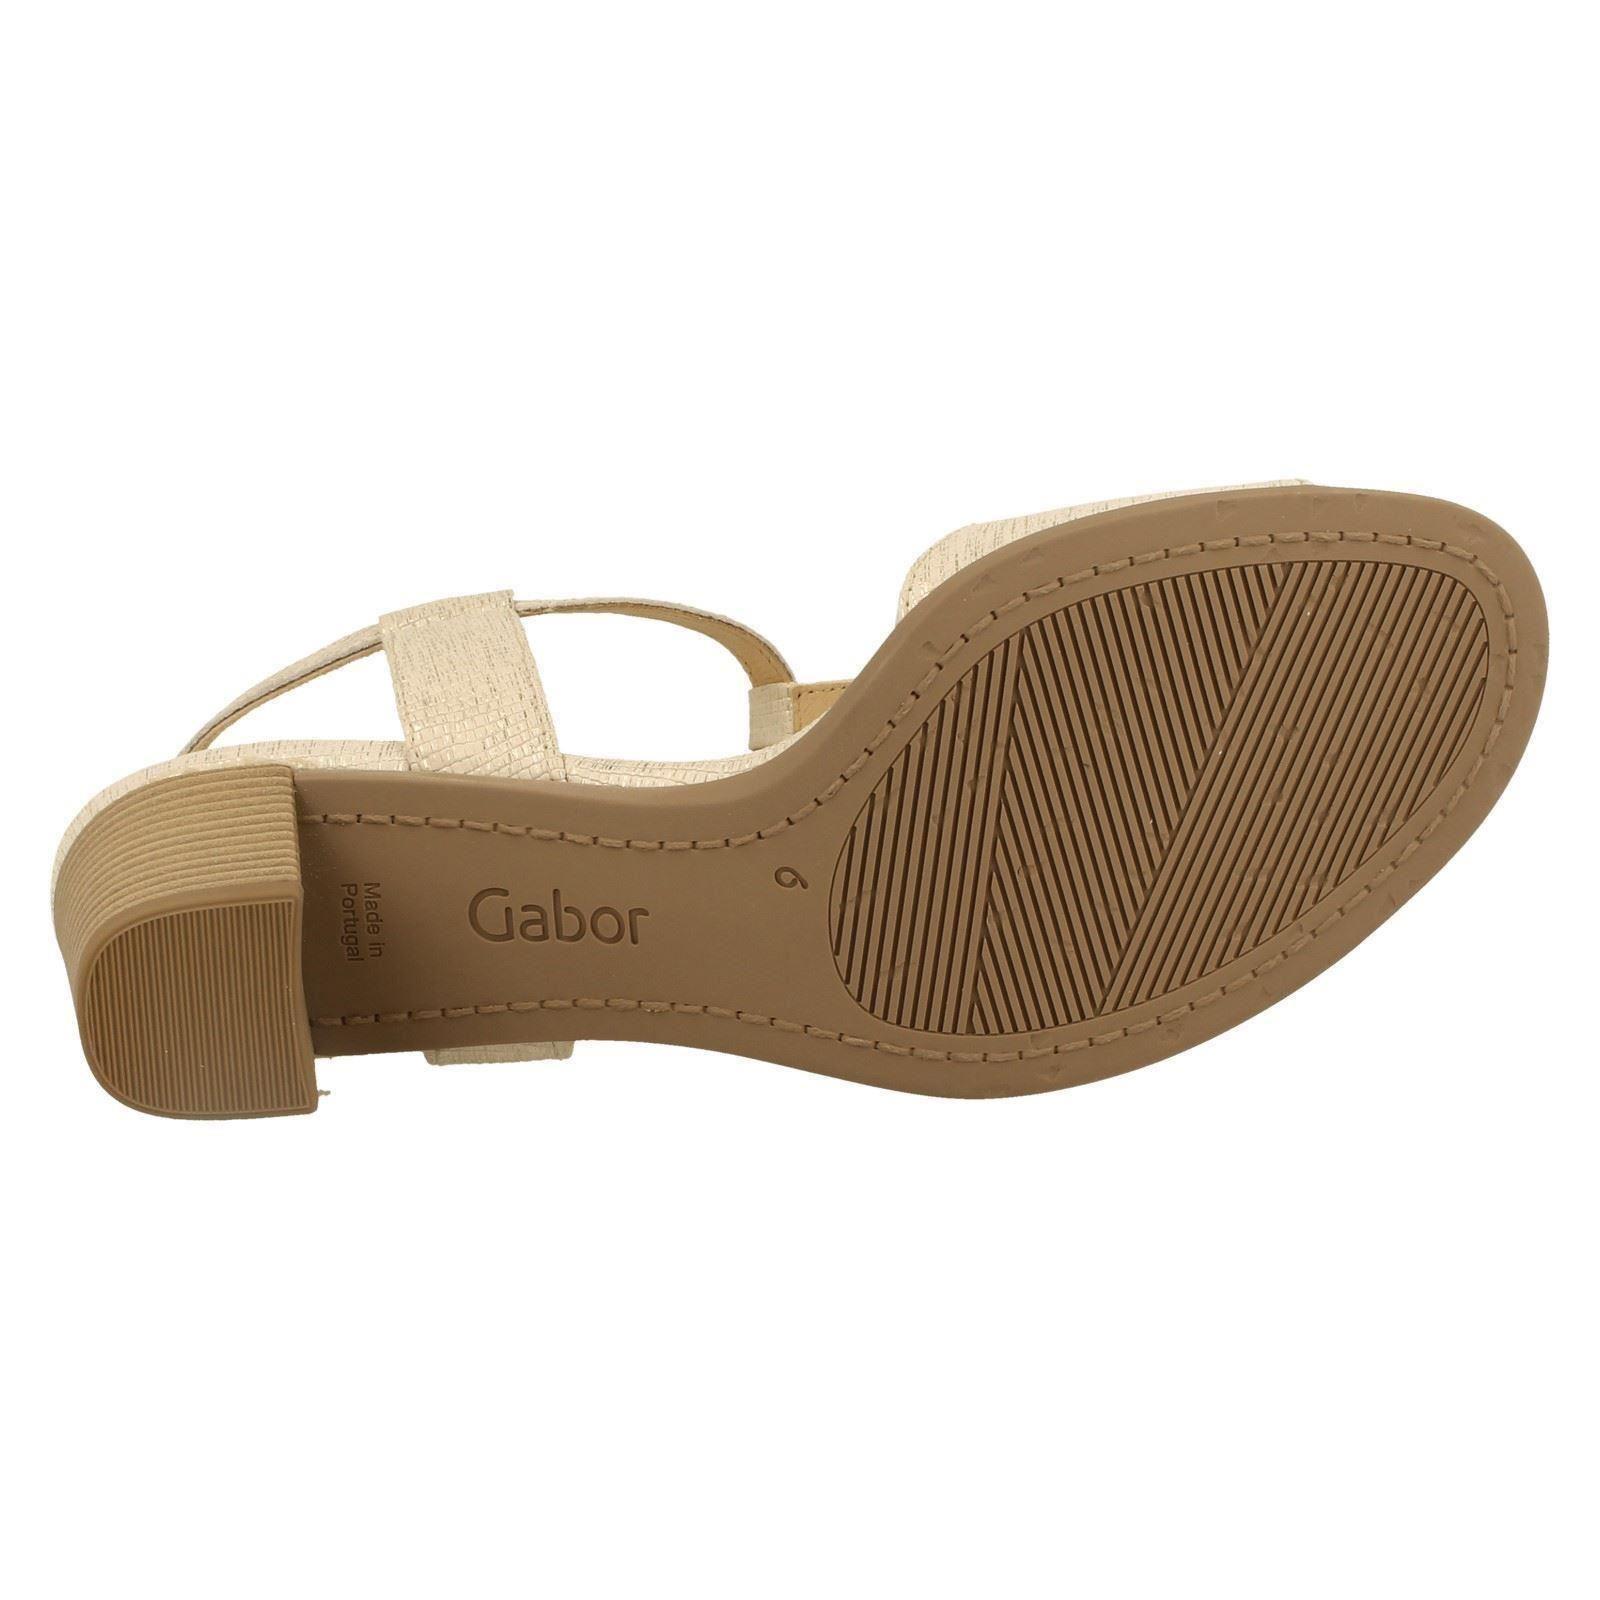 Steve Madden Madden Steve laaura S Mulo Pantofola Donna Muli 4713d4